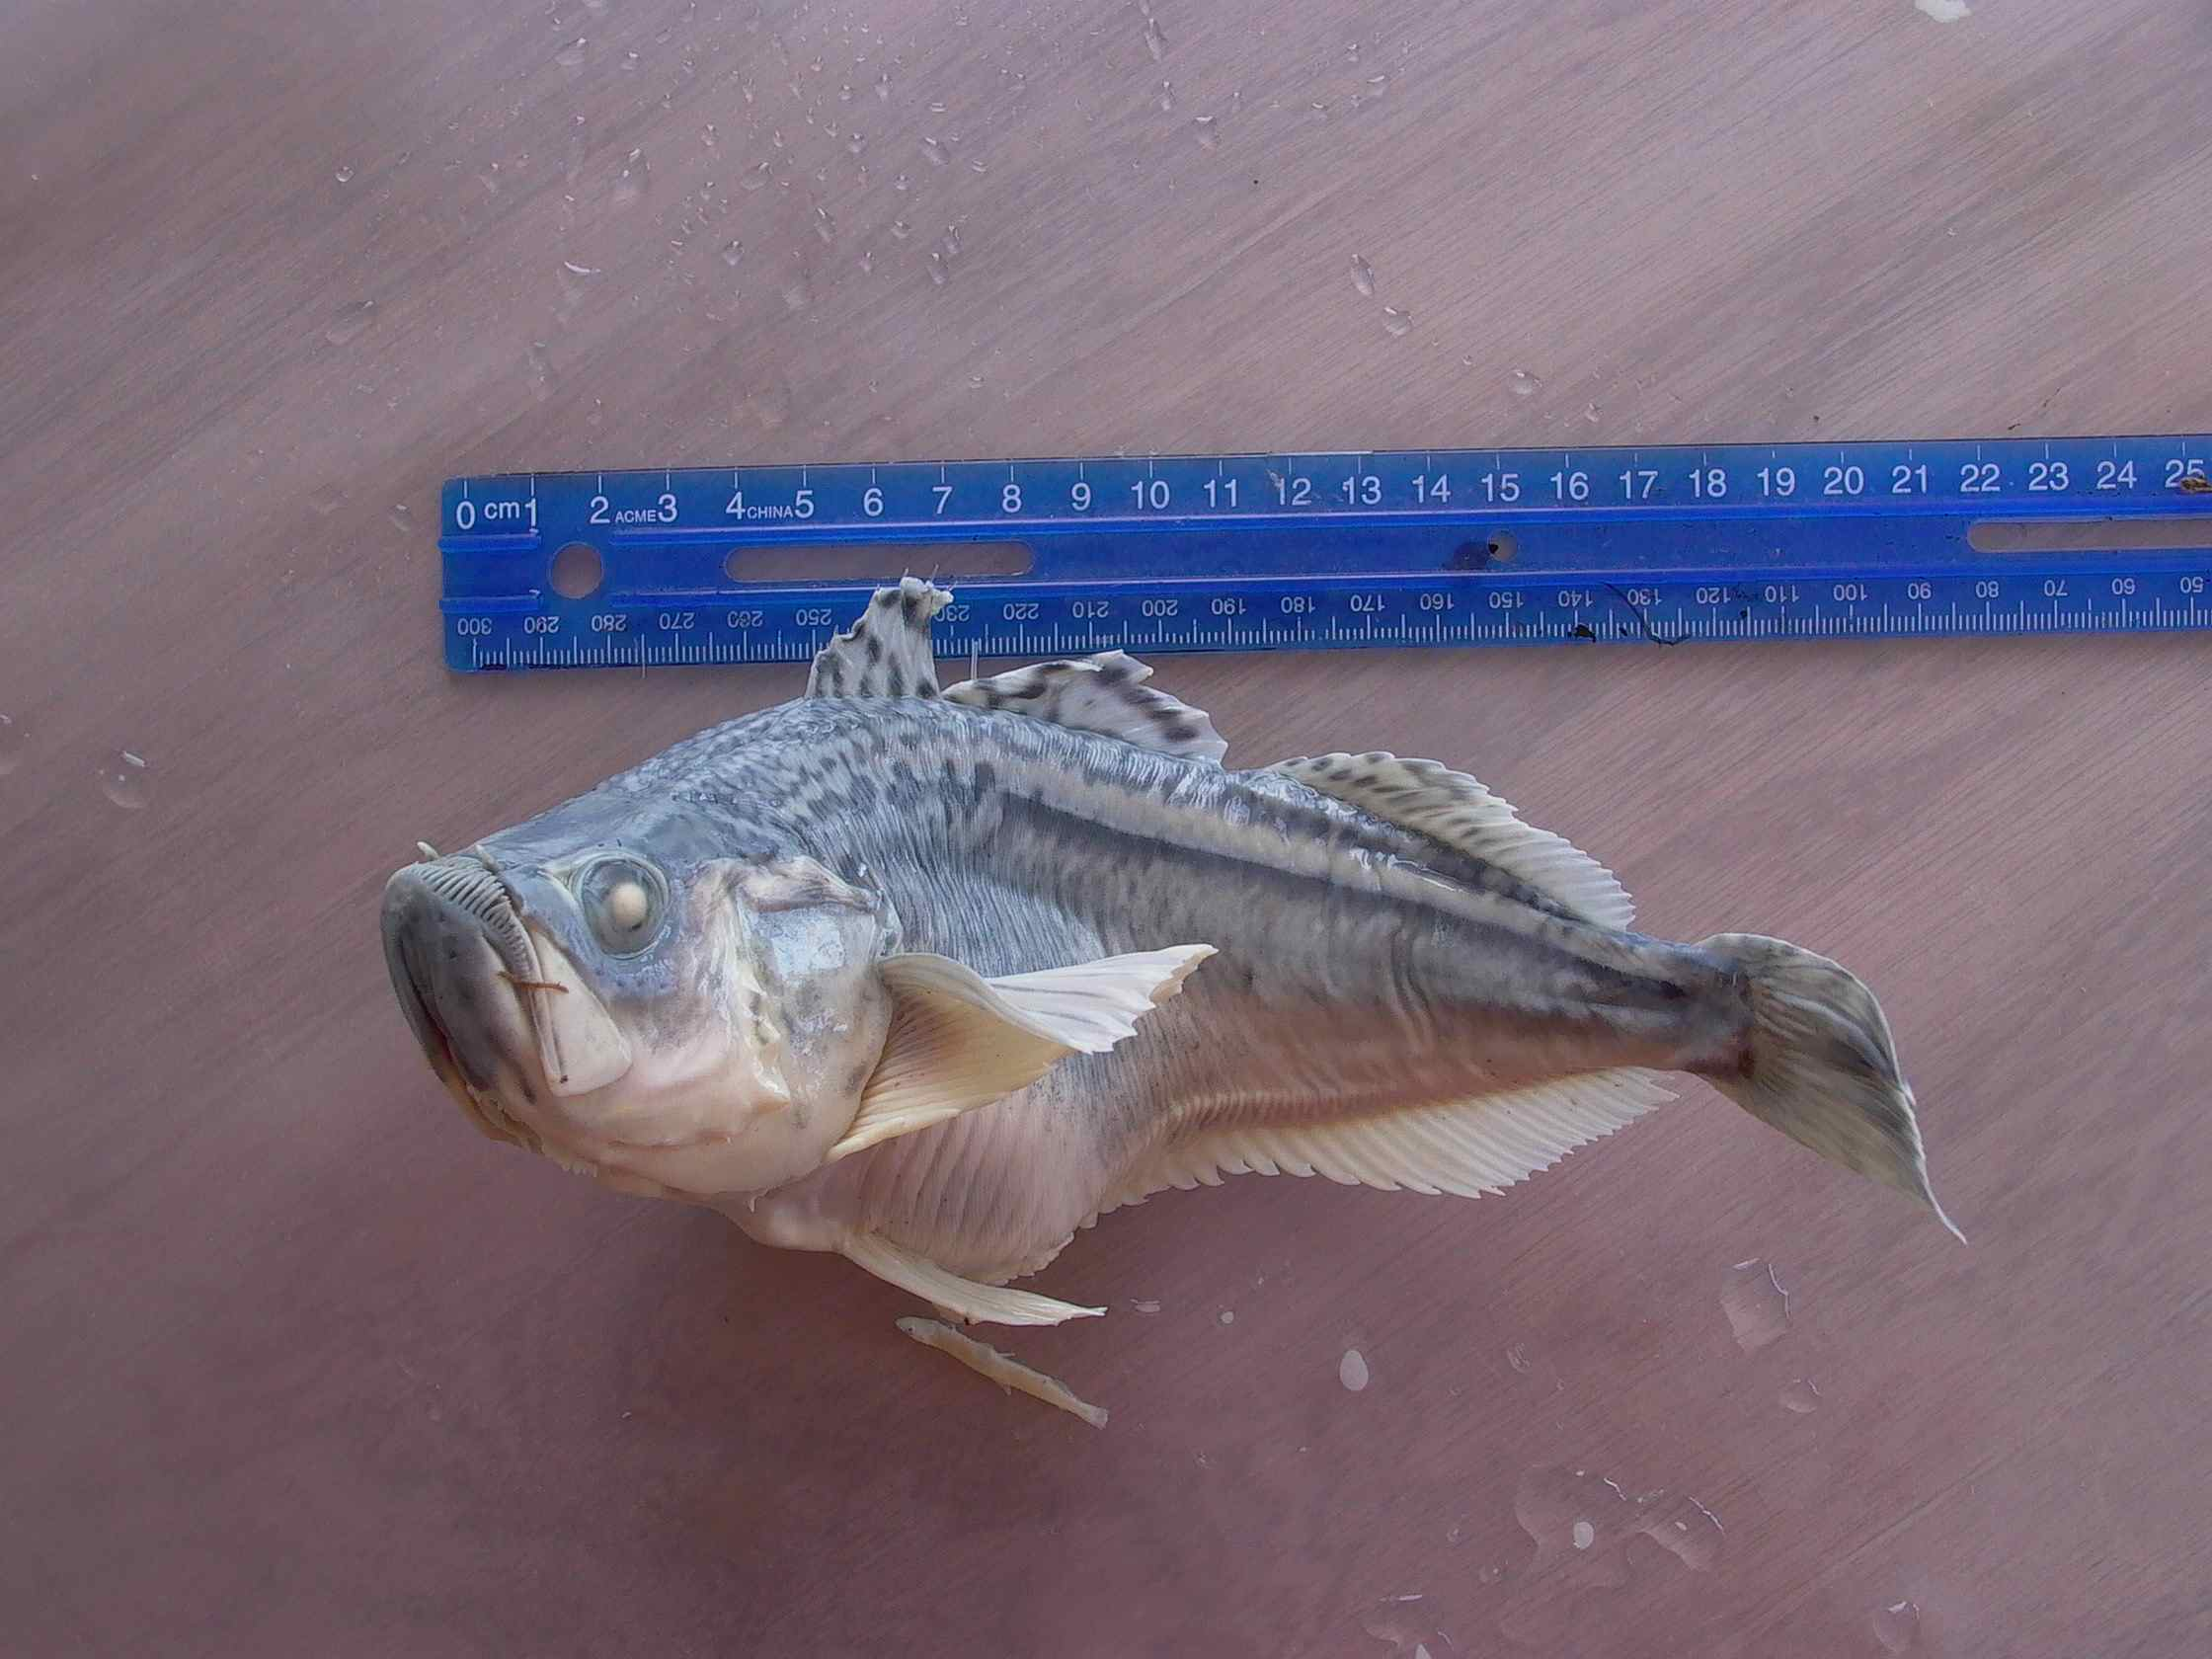 Cassiar Cannery - SERC - MB - JK - 2011/2012 - large sandfish